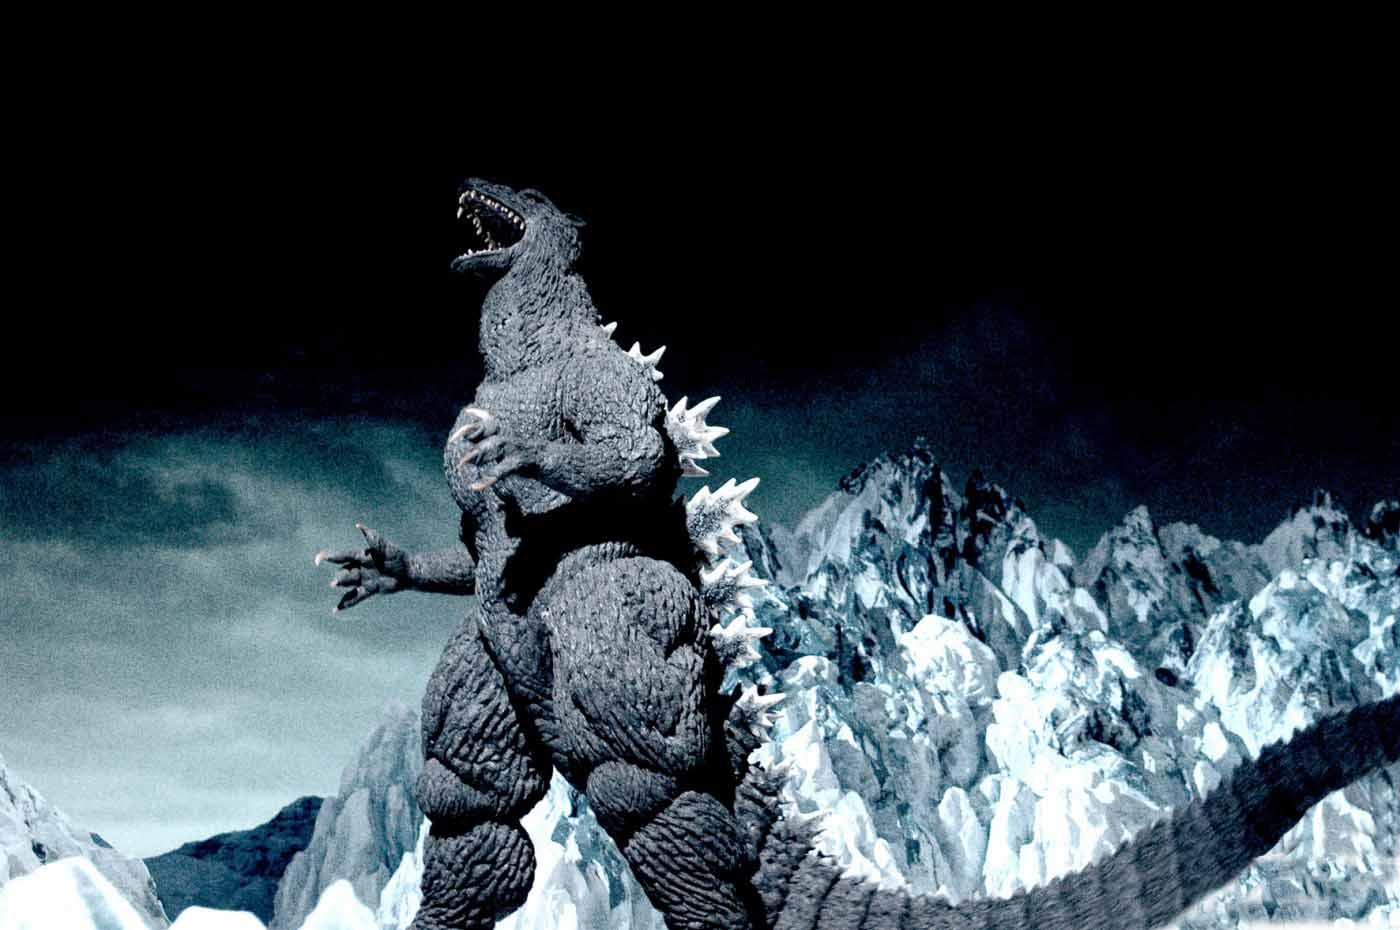 Godzilla roars to life in his last adventure.